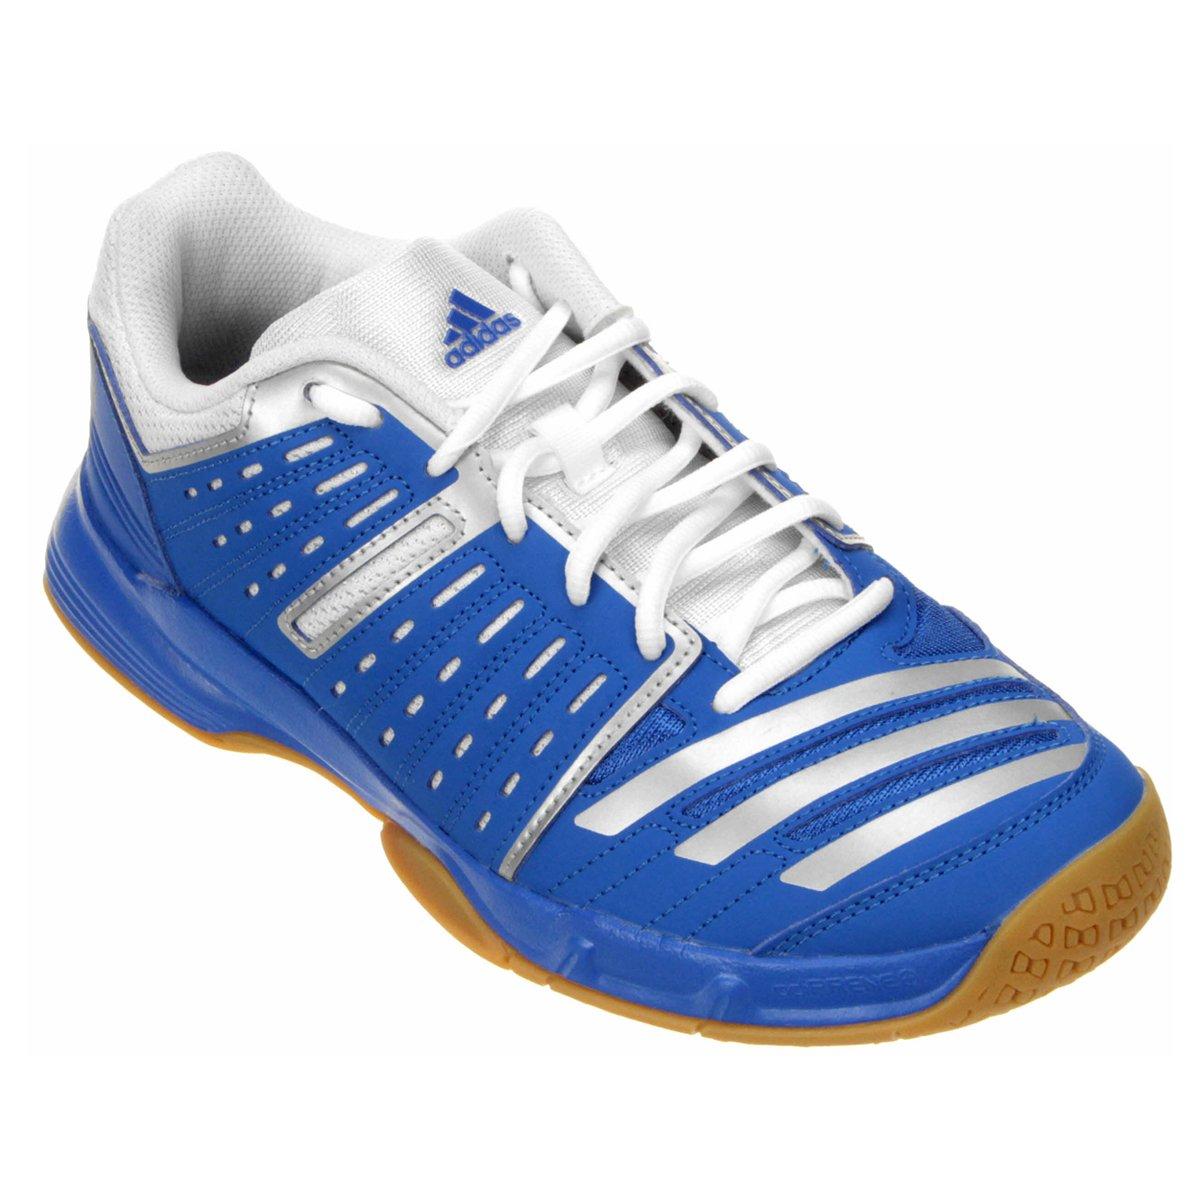 a6c5c5bc17 Tênis Adidas Essence 12 - Shopping TudoAzul